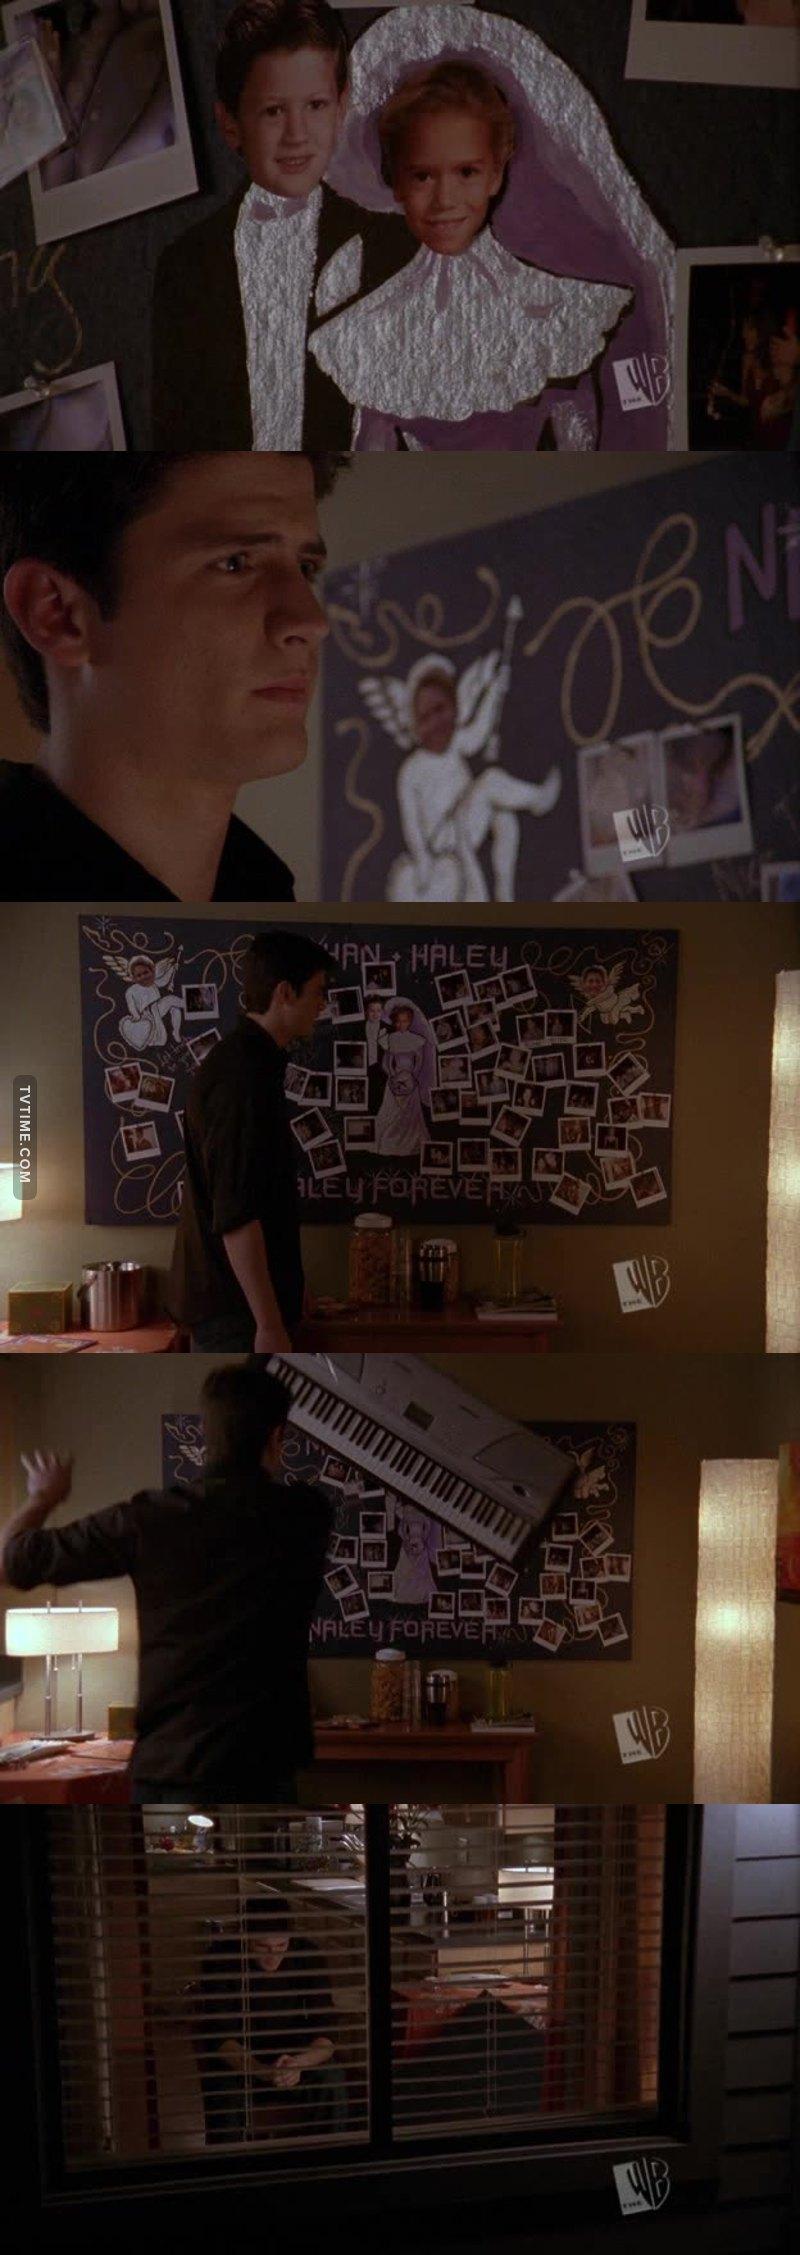 Nathan deserves so much better ☹️